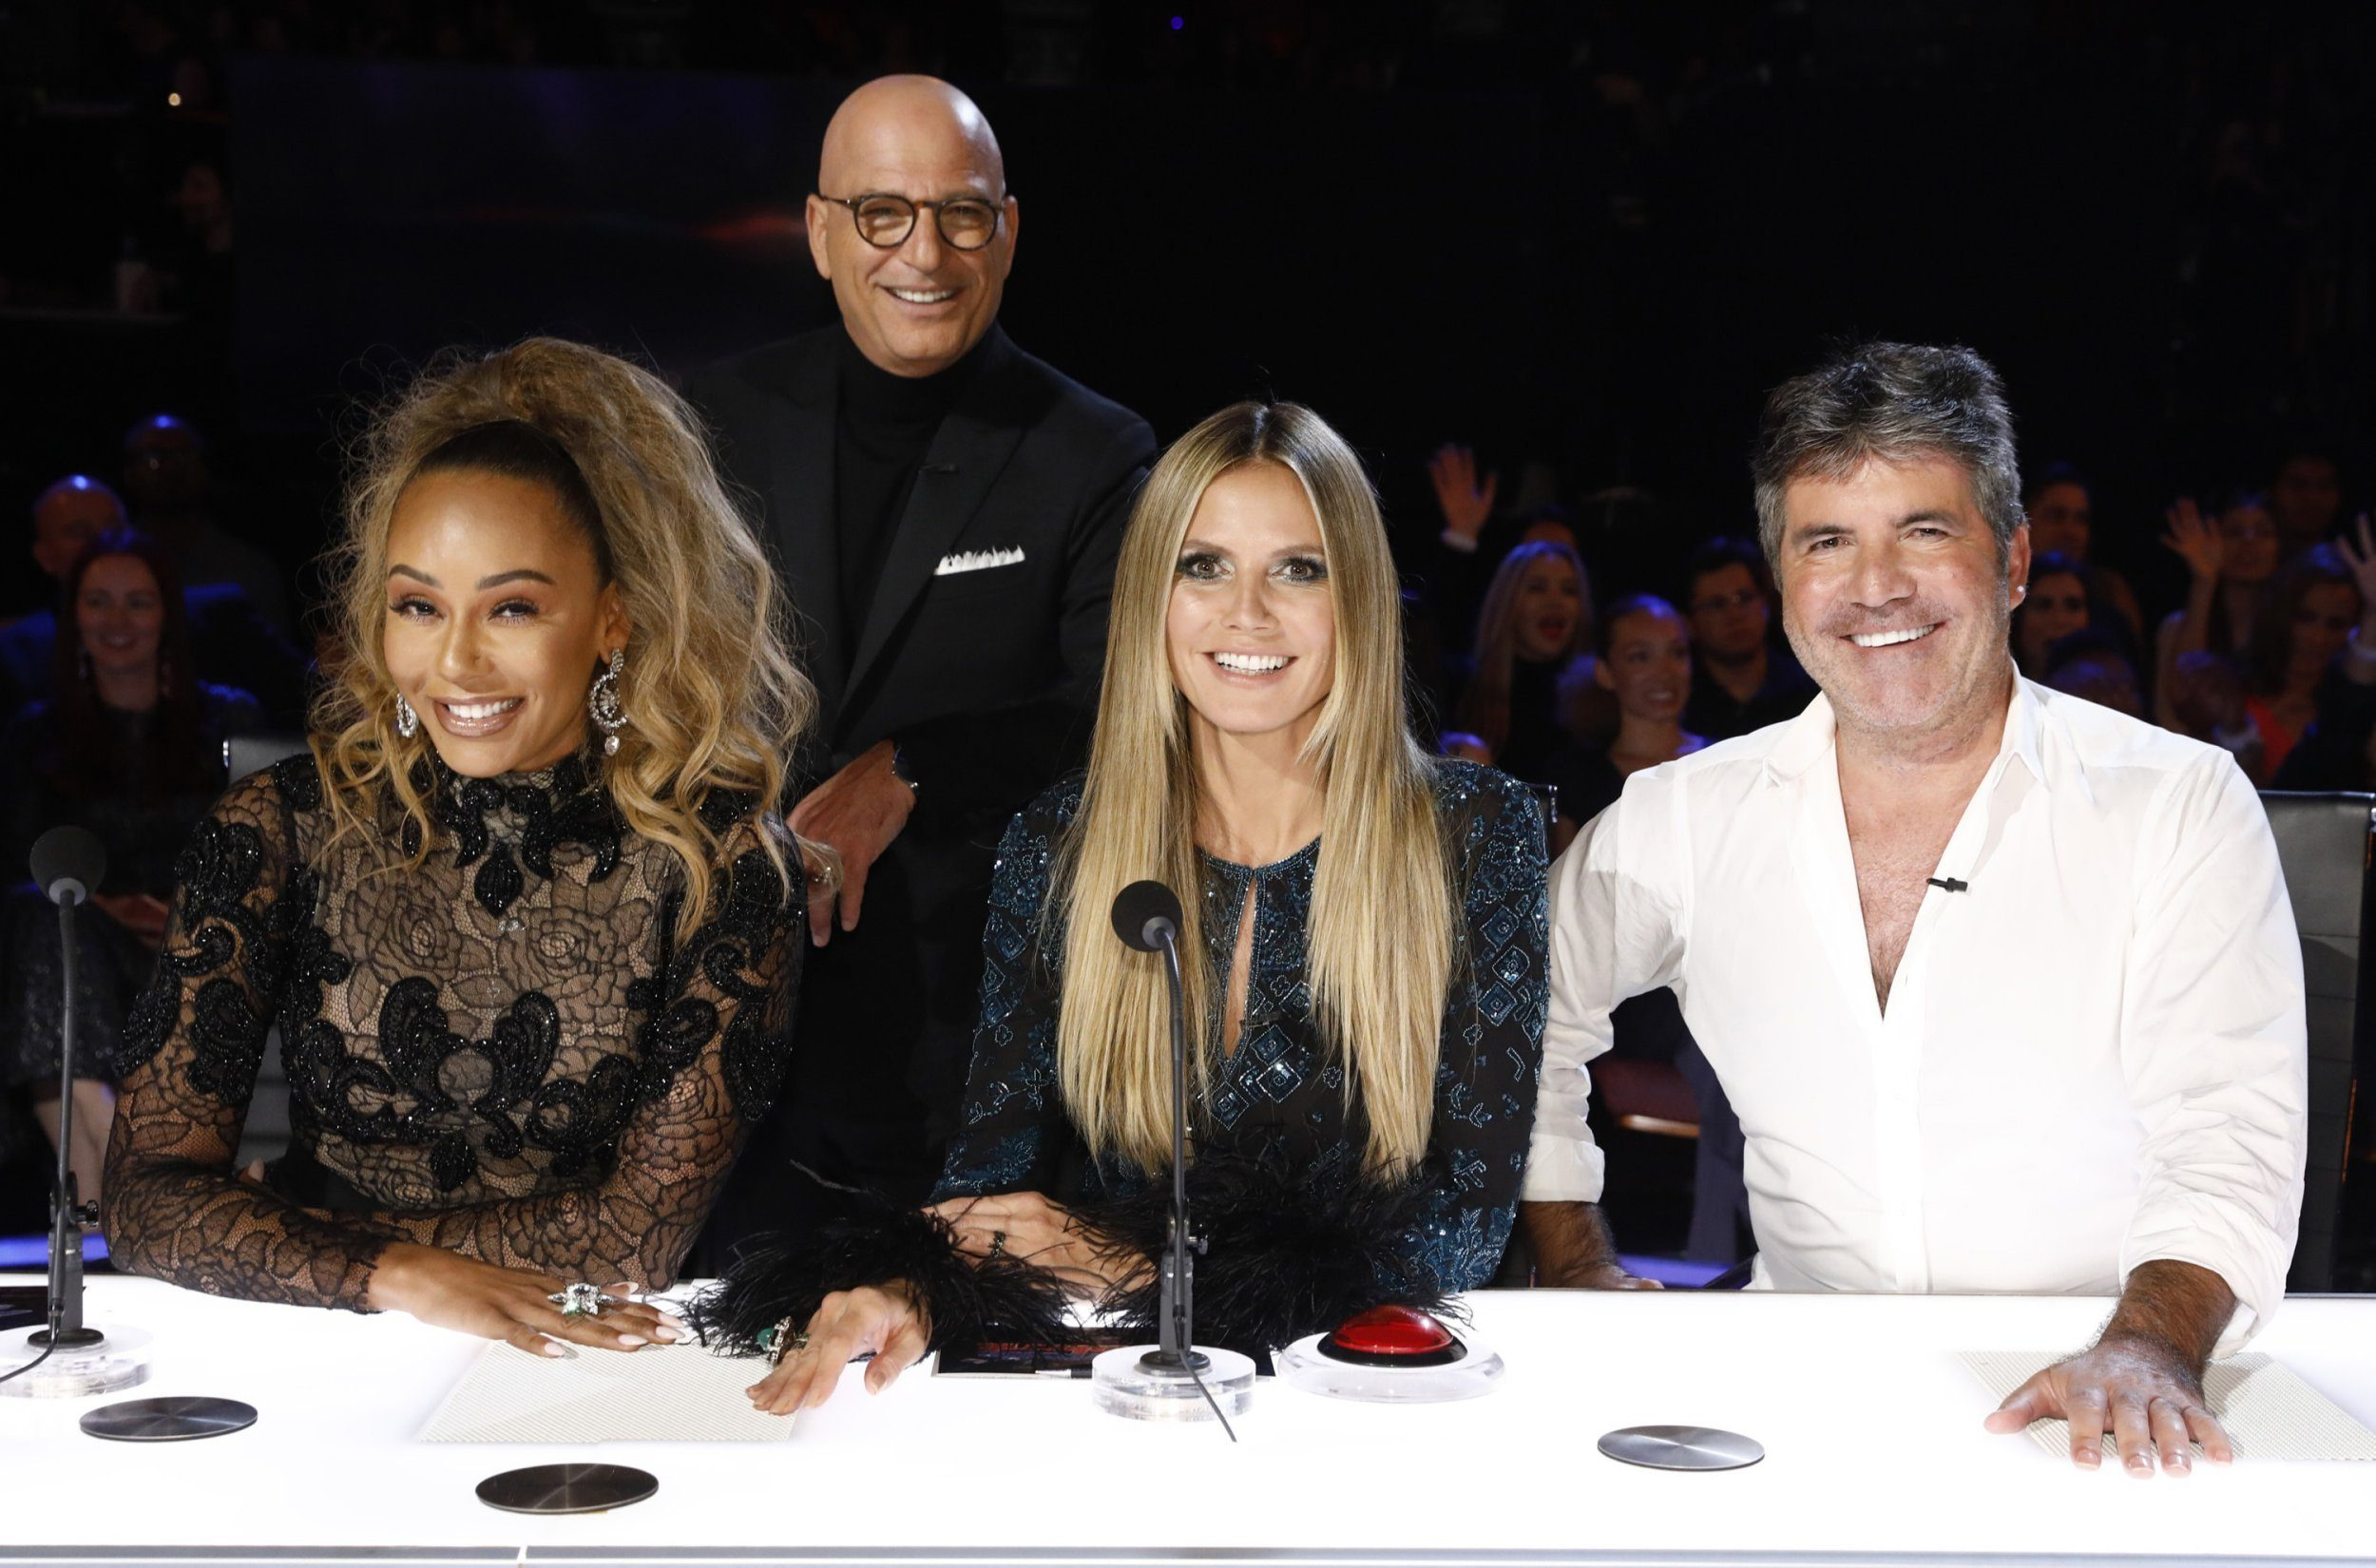 America's Got Talent's Heidi Klum explains rules of The Champions as Susan Boyle prepares for comeback